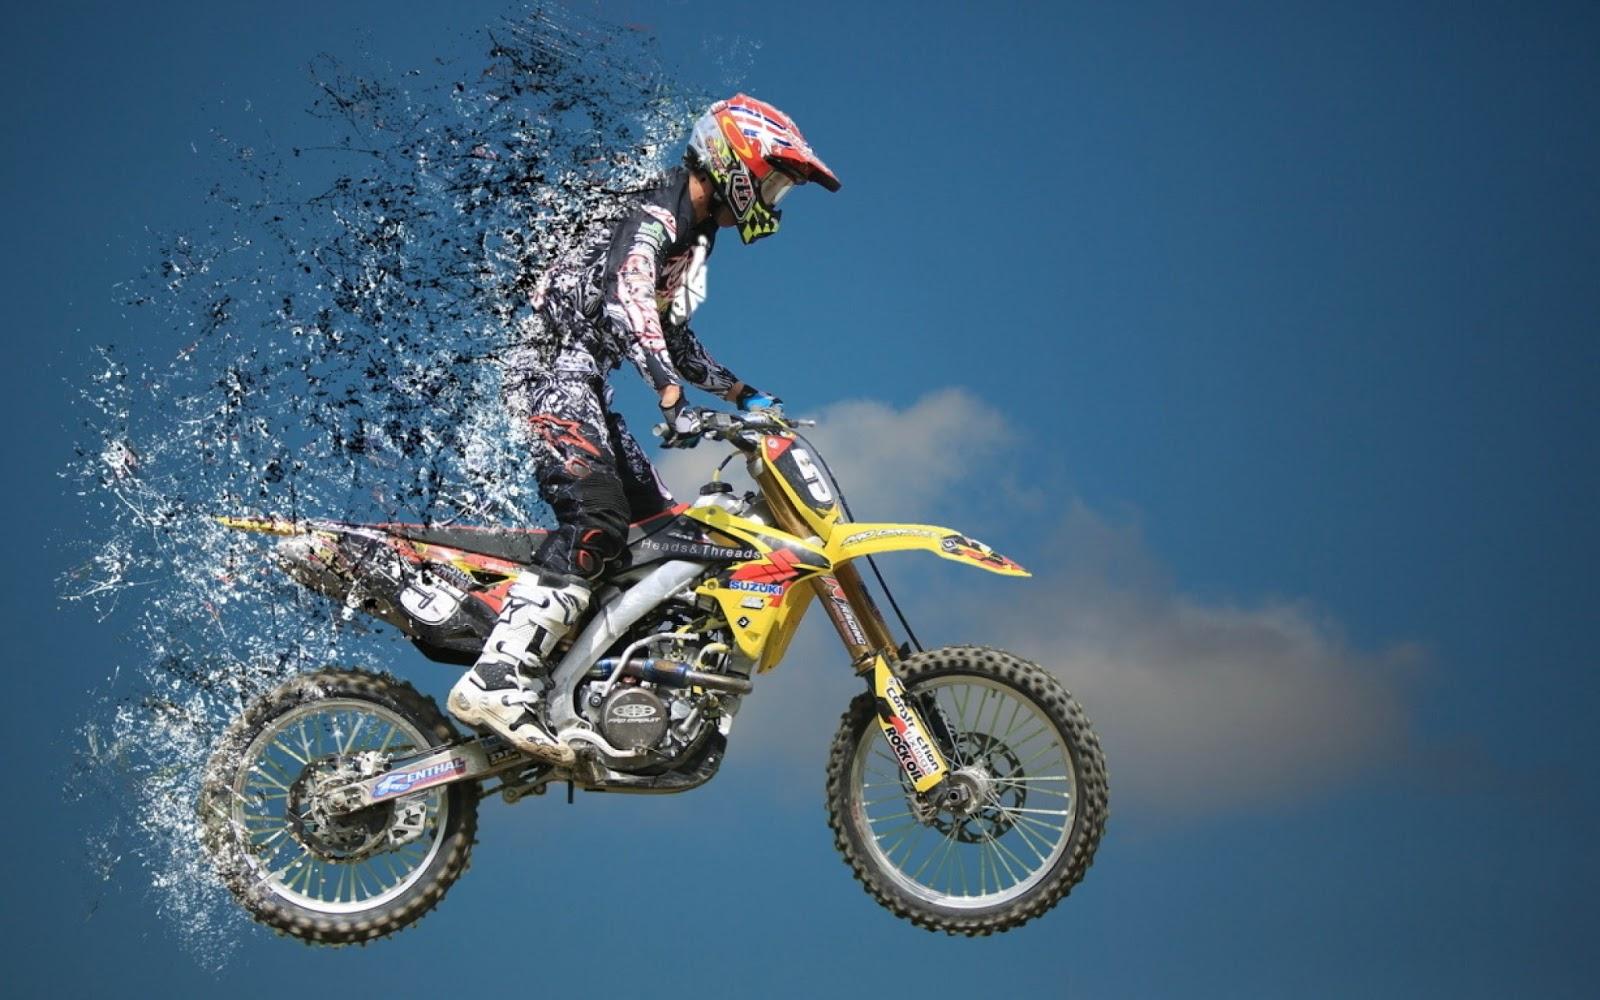 Bike Stunt HD WallpaperBike Hd Wallpaper 1080p Images Of Pulsar 220sports Wallpaperindian Photoscool